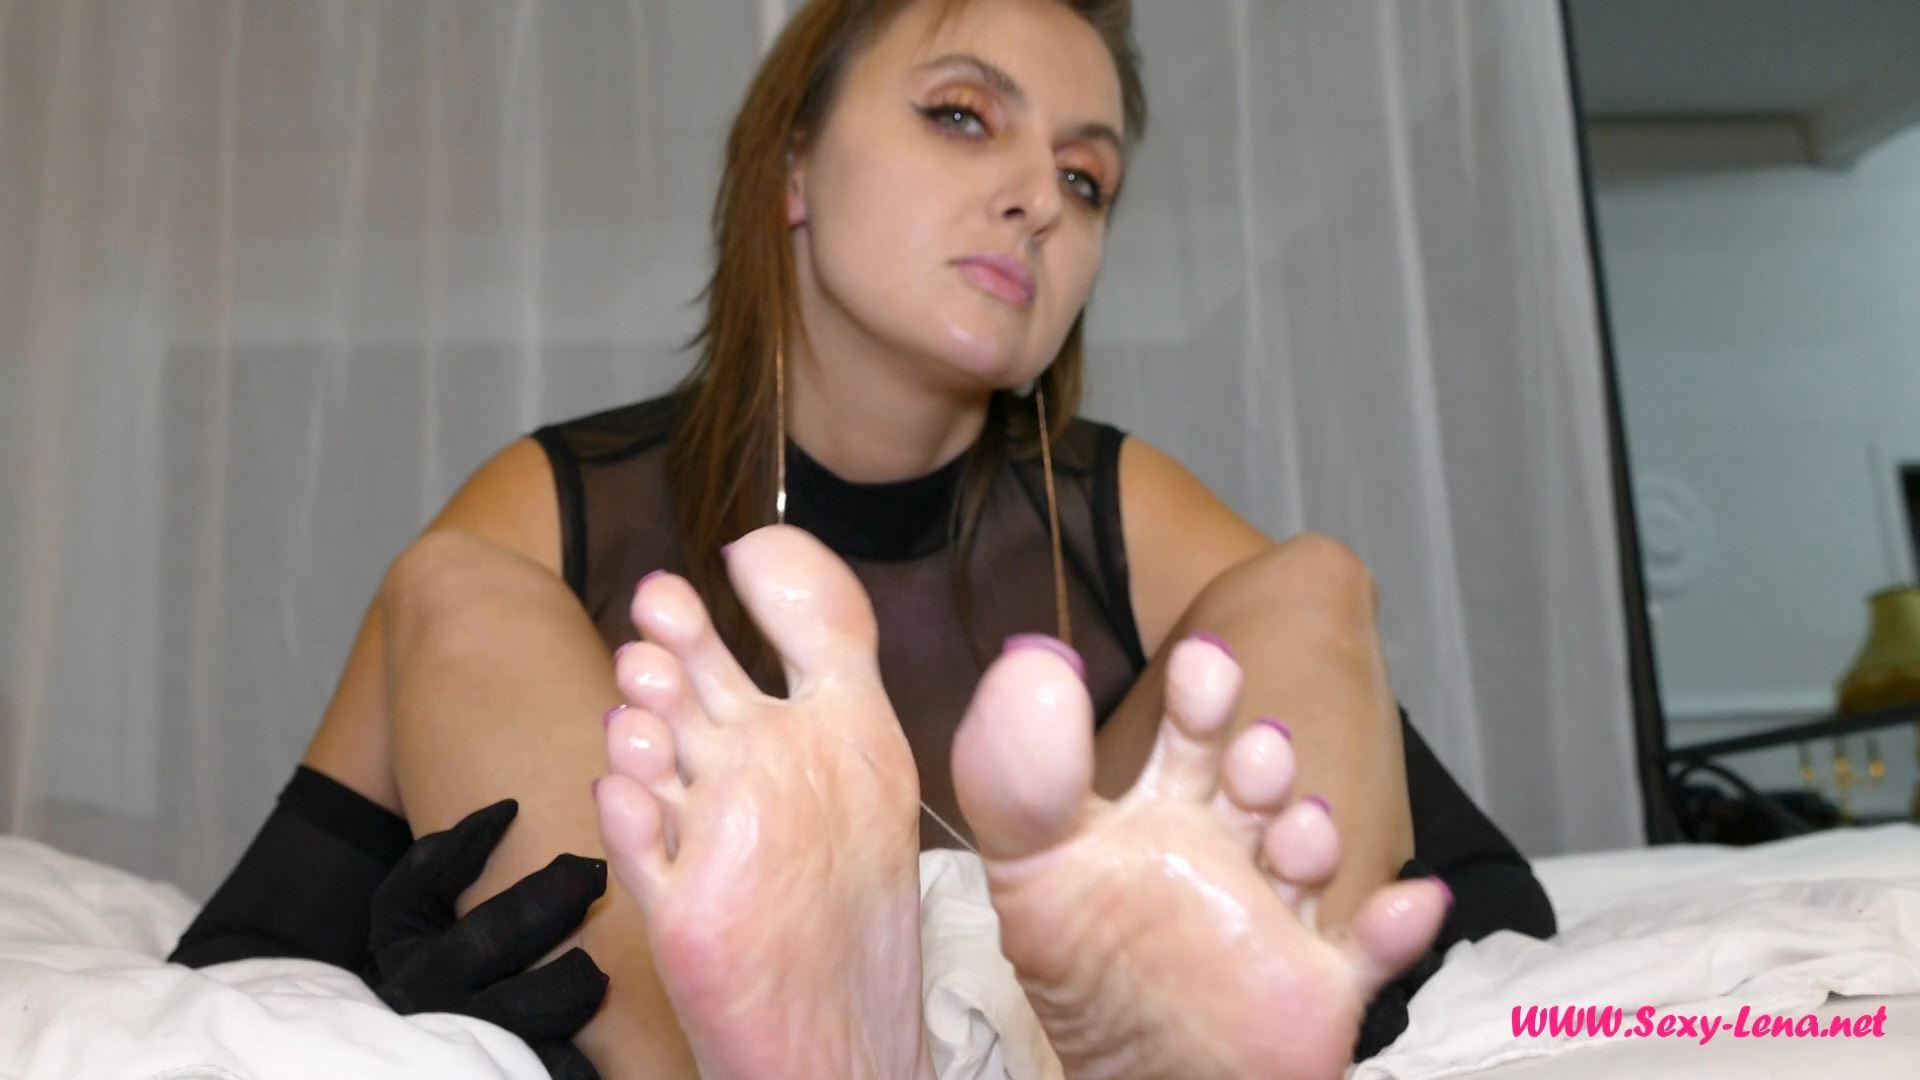 Fetish Model Lena In Scene: I Spit On My Feet - SEXY LENA VIP - FULL HD/1080p/MP4